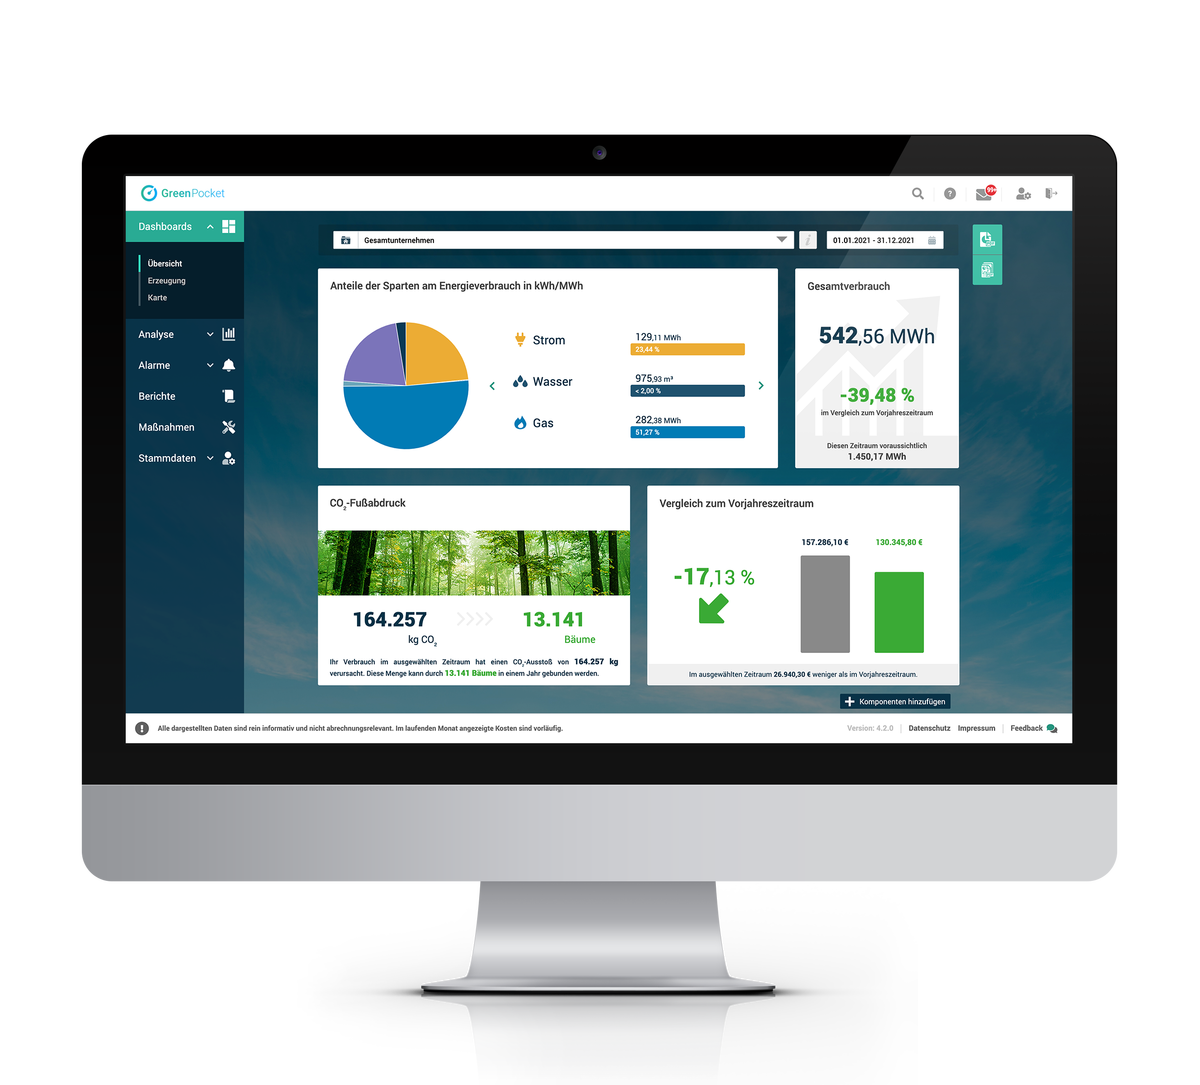 Ac5dcf29e223 Green Pocket Abb 2 Energiemanagement Software